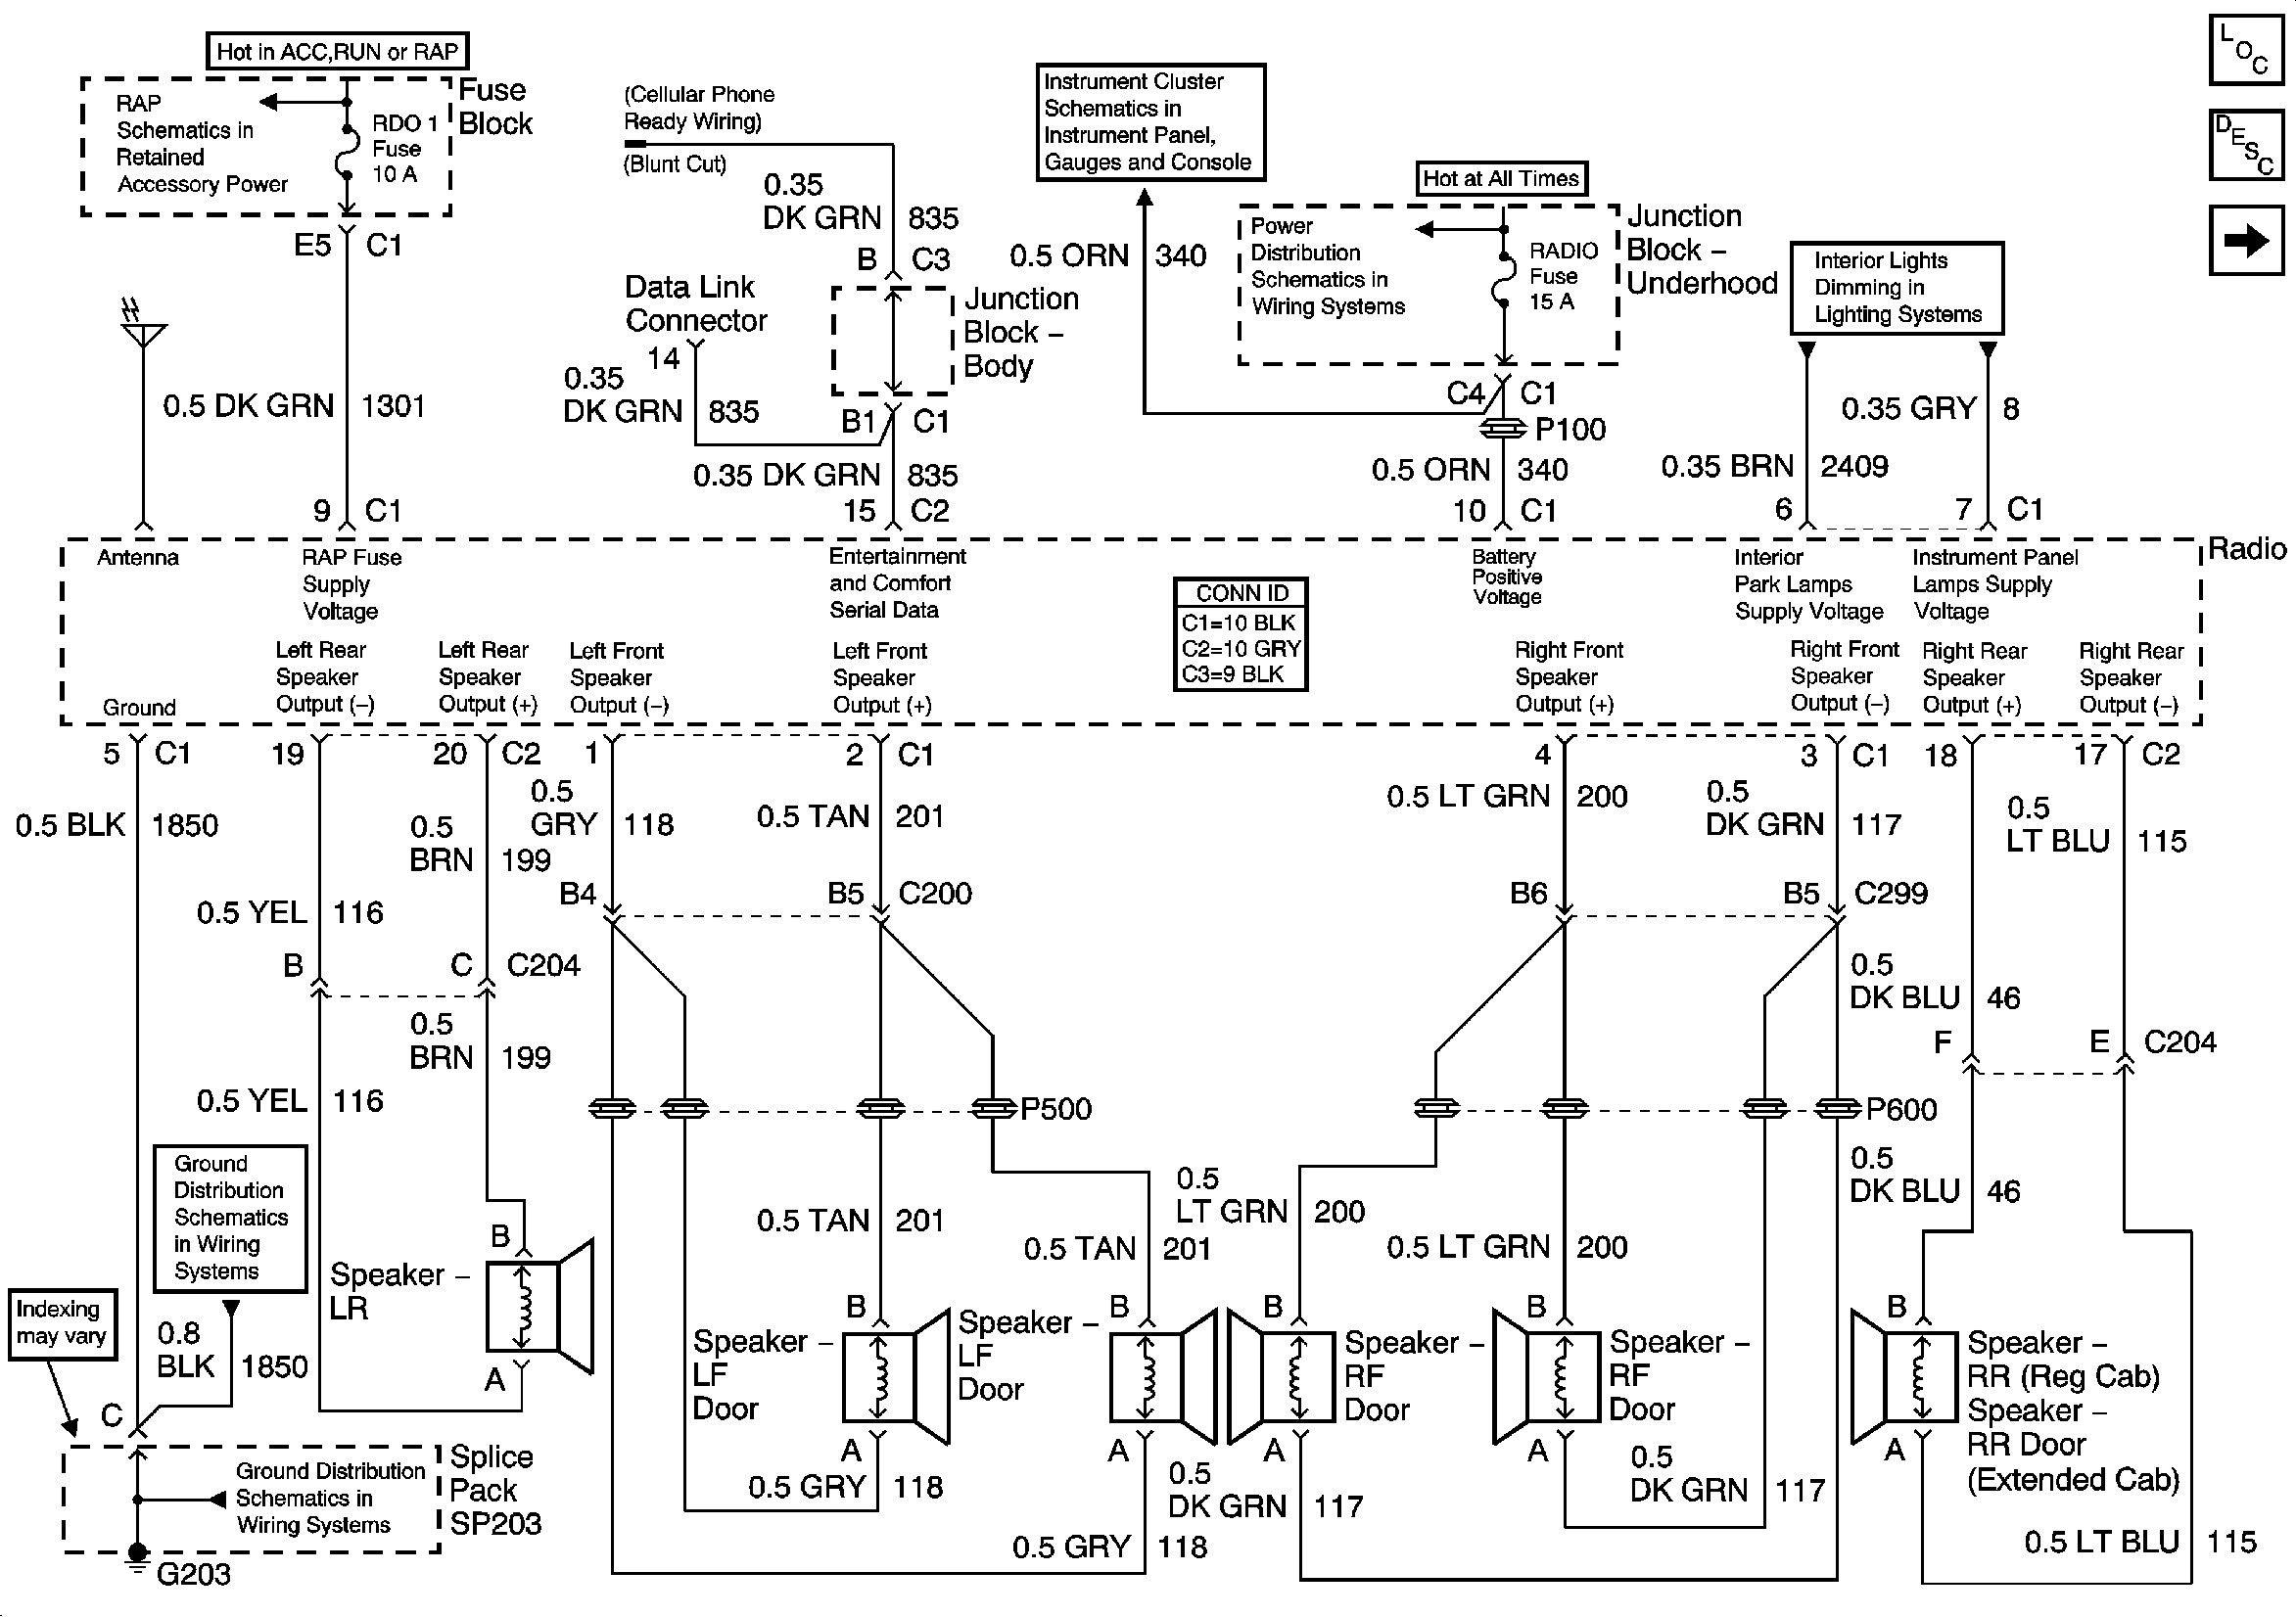 New Golf 4 Radio Wiring Diagram Diagram Diagramsample Diagramtemplate Check More At Https Mornin 2004 Chevy Silverado Chevy Silverado Chevy Silverado 1500